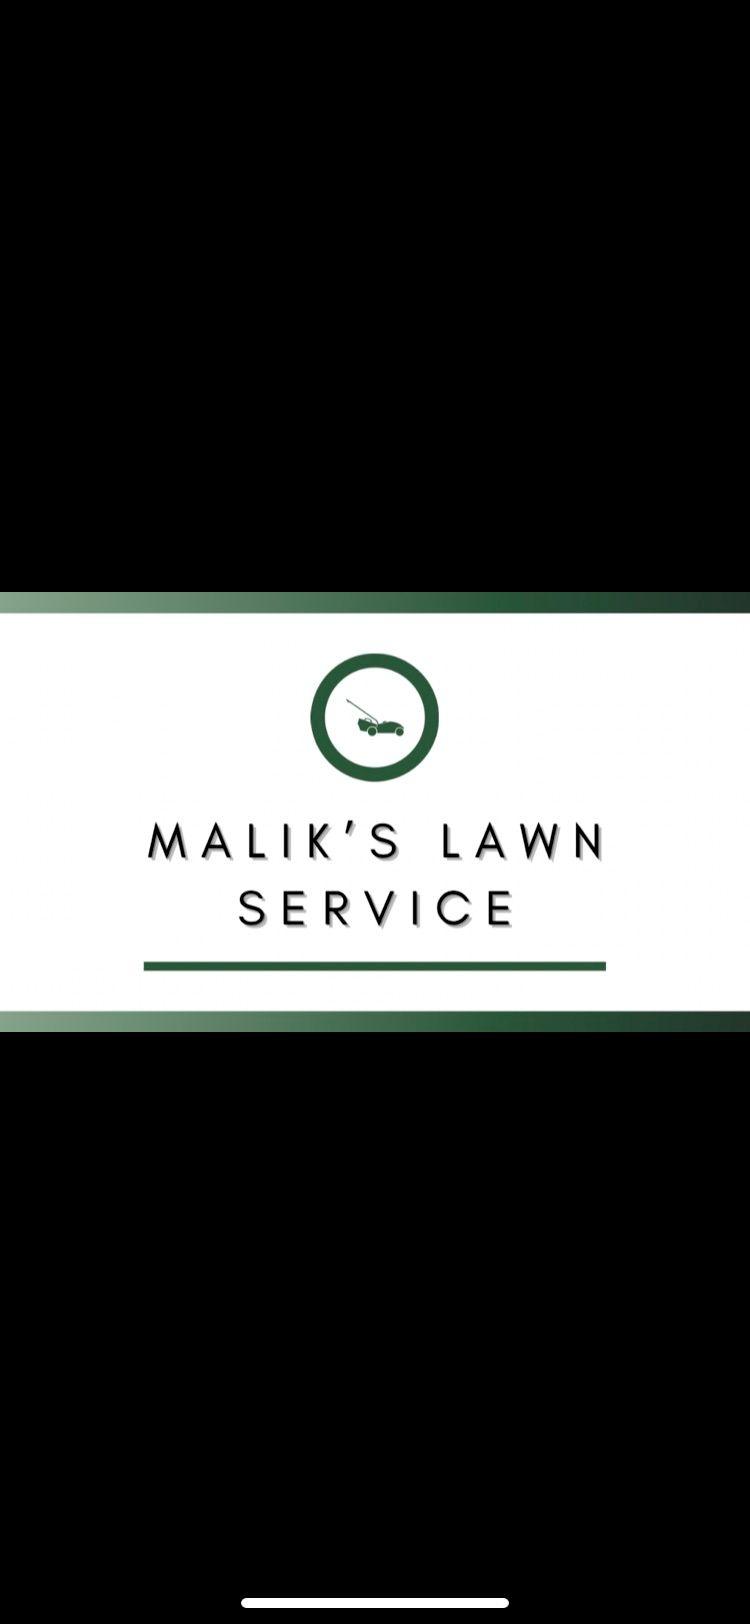 Malik's lawn service